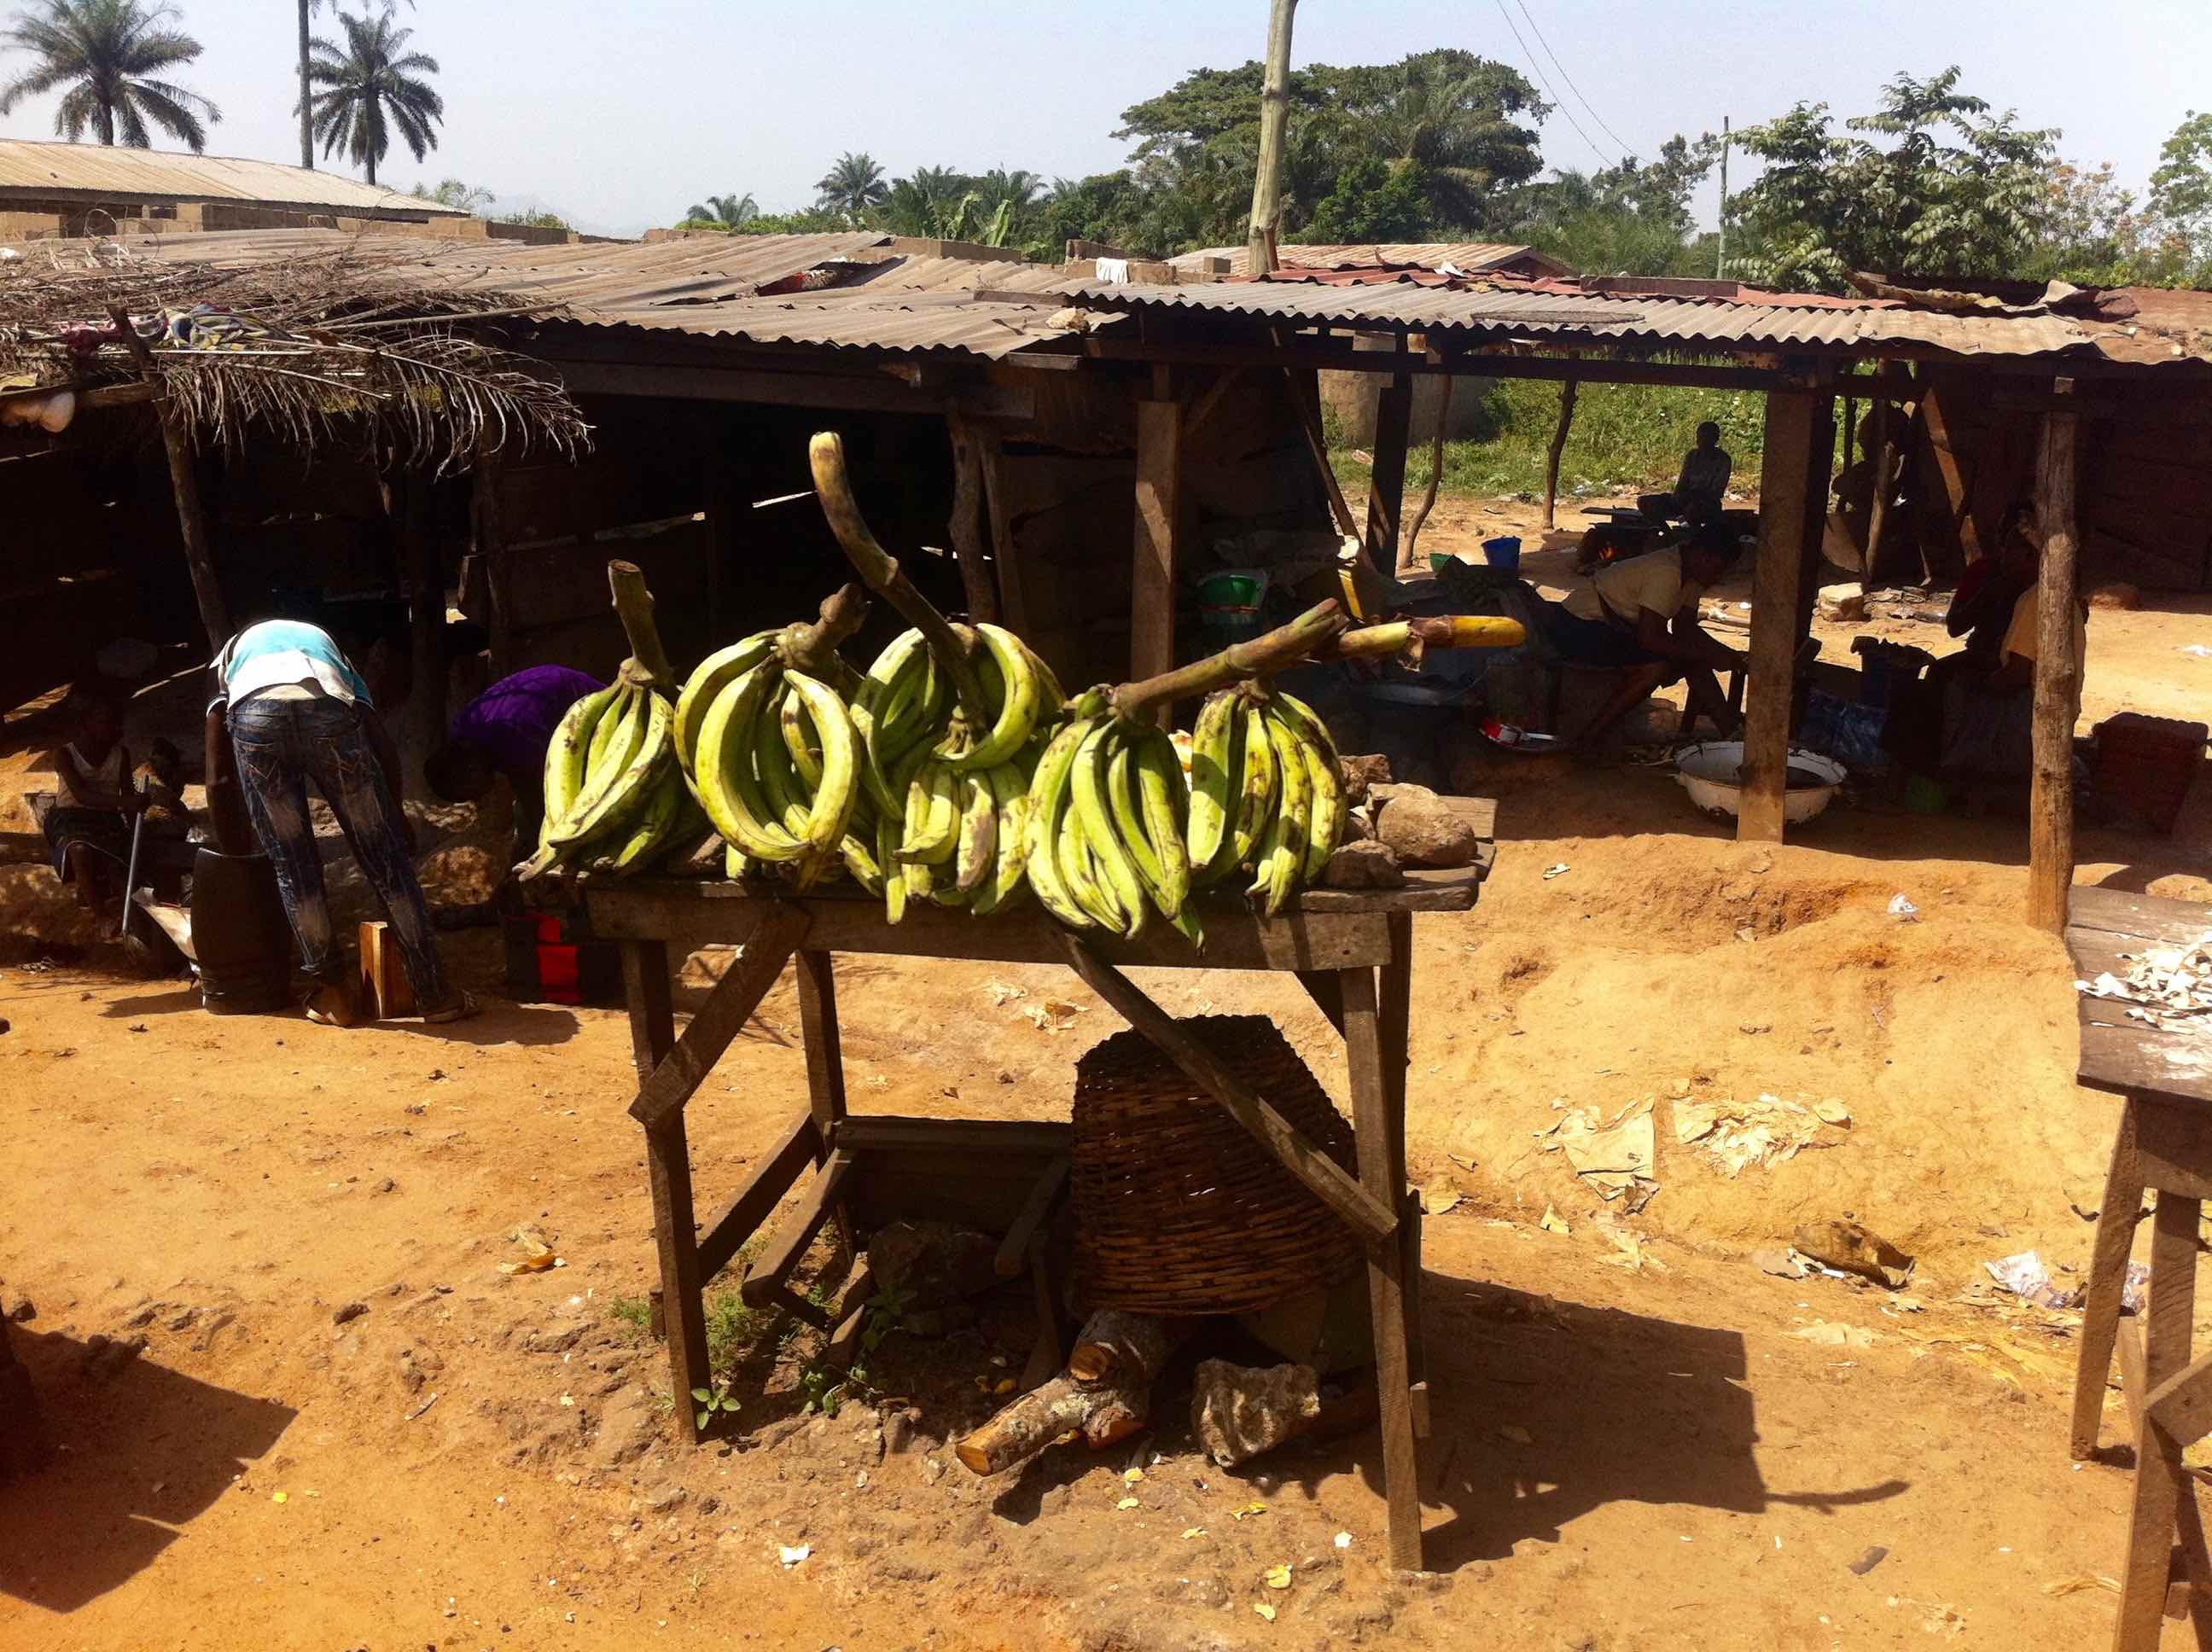 Green plantains, roadside market, Ibillo, Edo, Nigeria. #JujuFilms